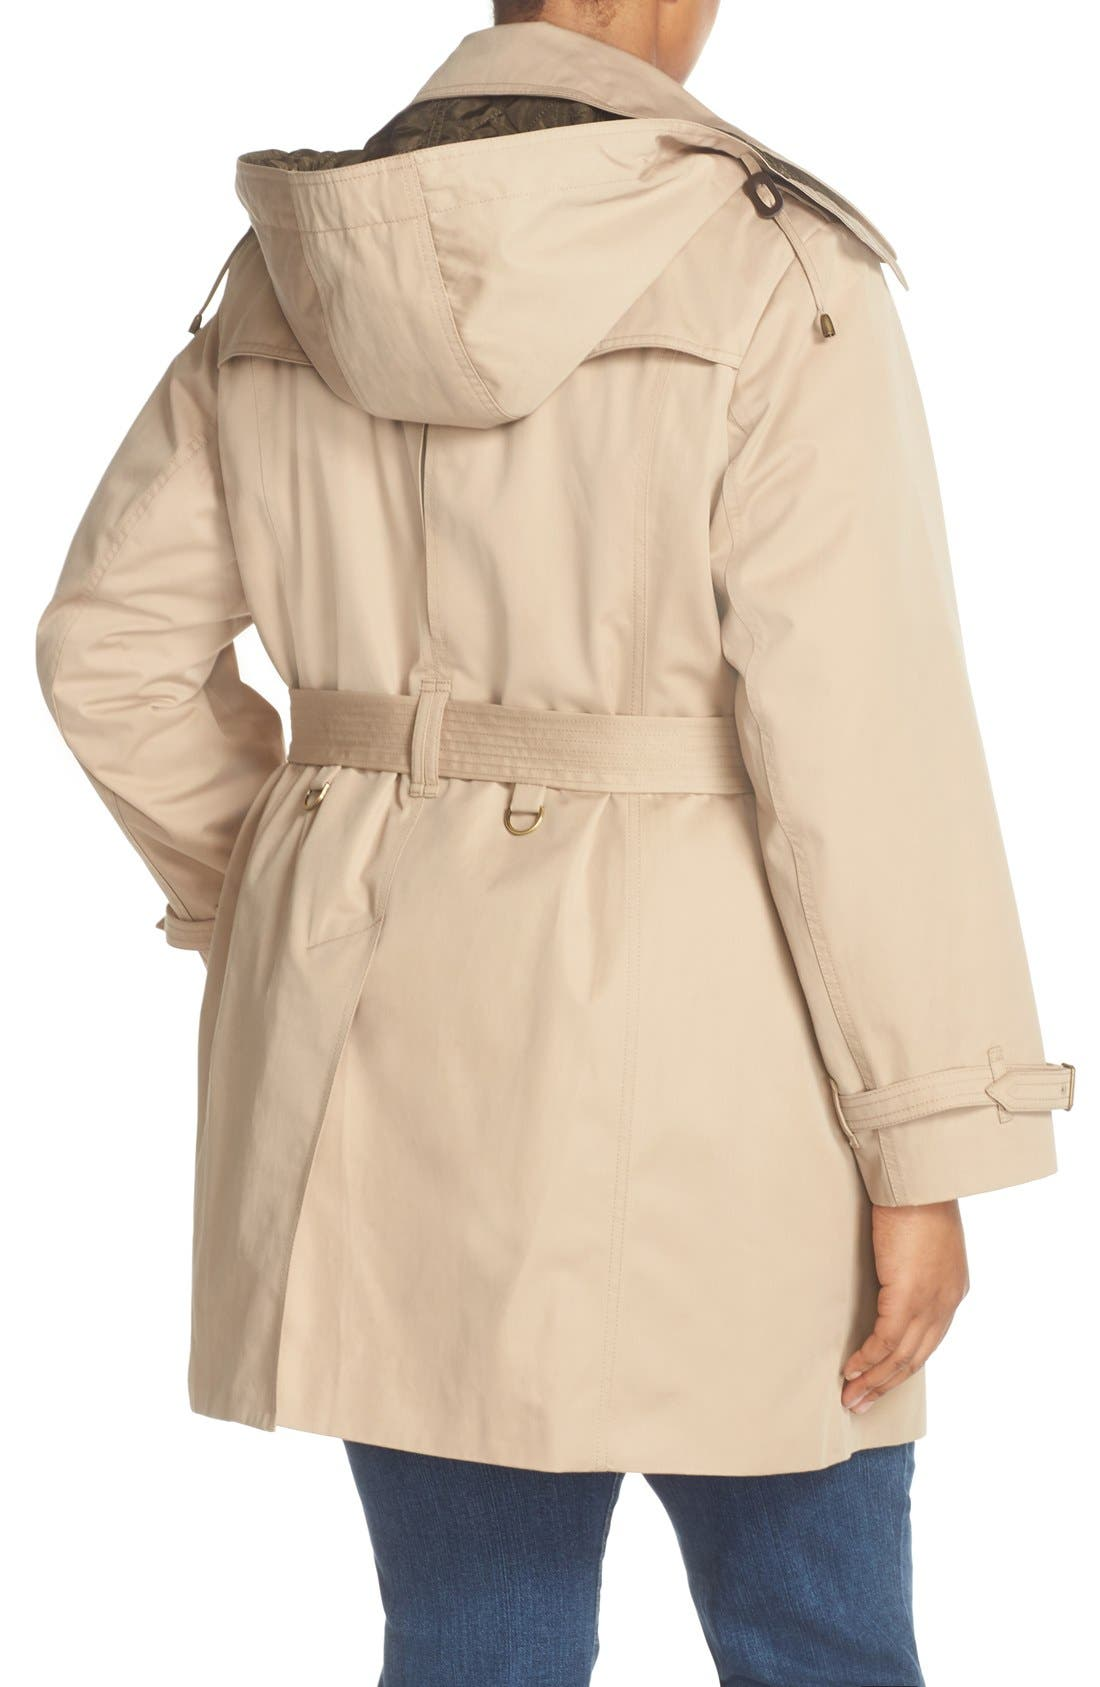 Alternate Image 2  - London Fog Single Breasted Trench Coat (Plus Size)